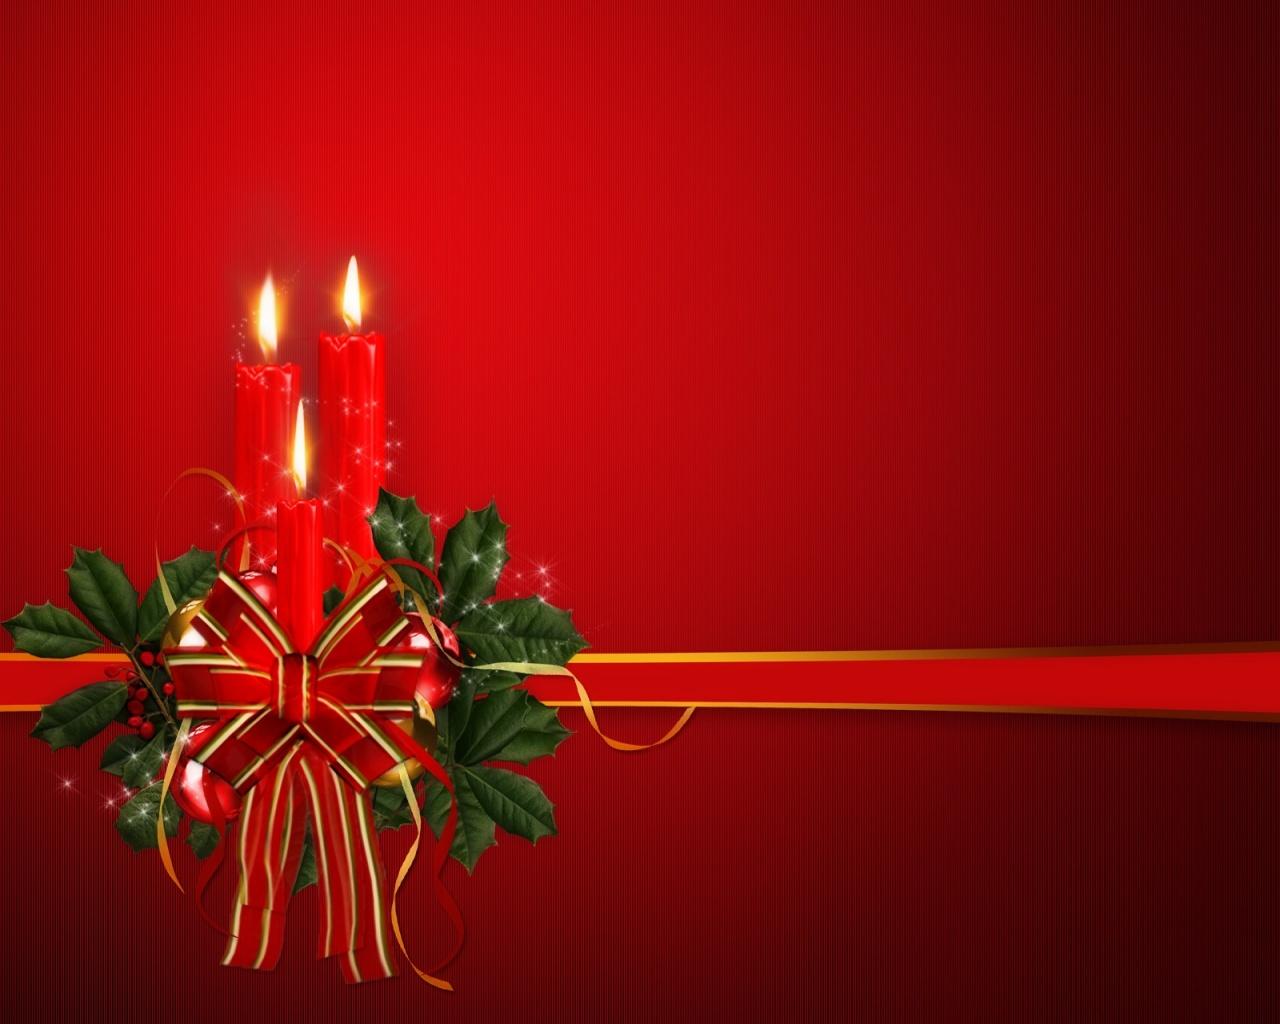 1280x1024 Christmas candles desktop PC and Mac wallpaper 1280x1024